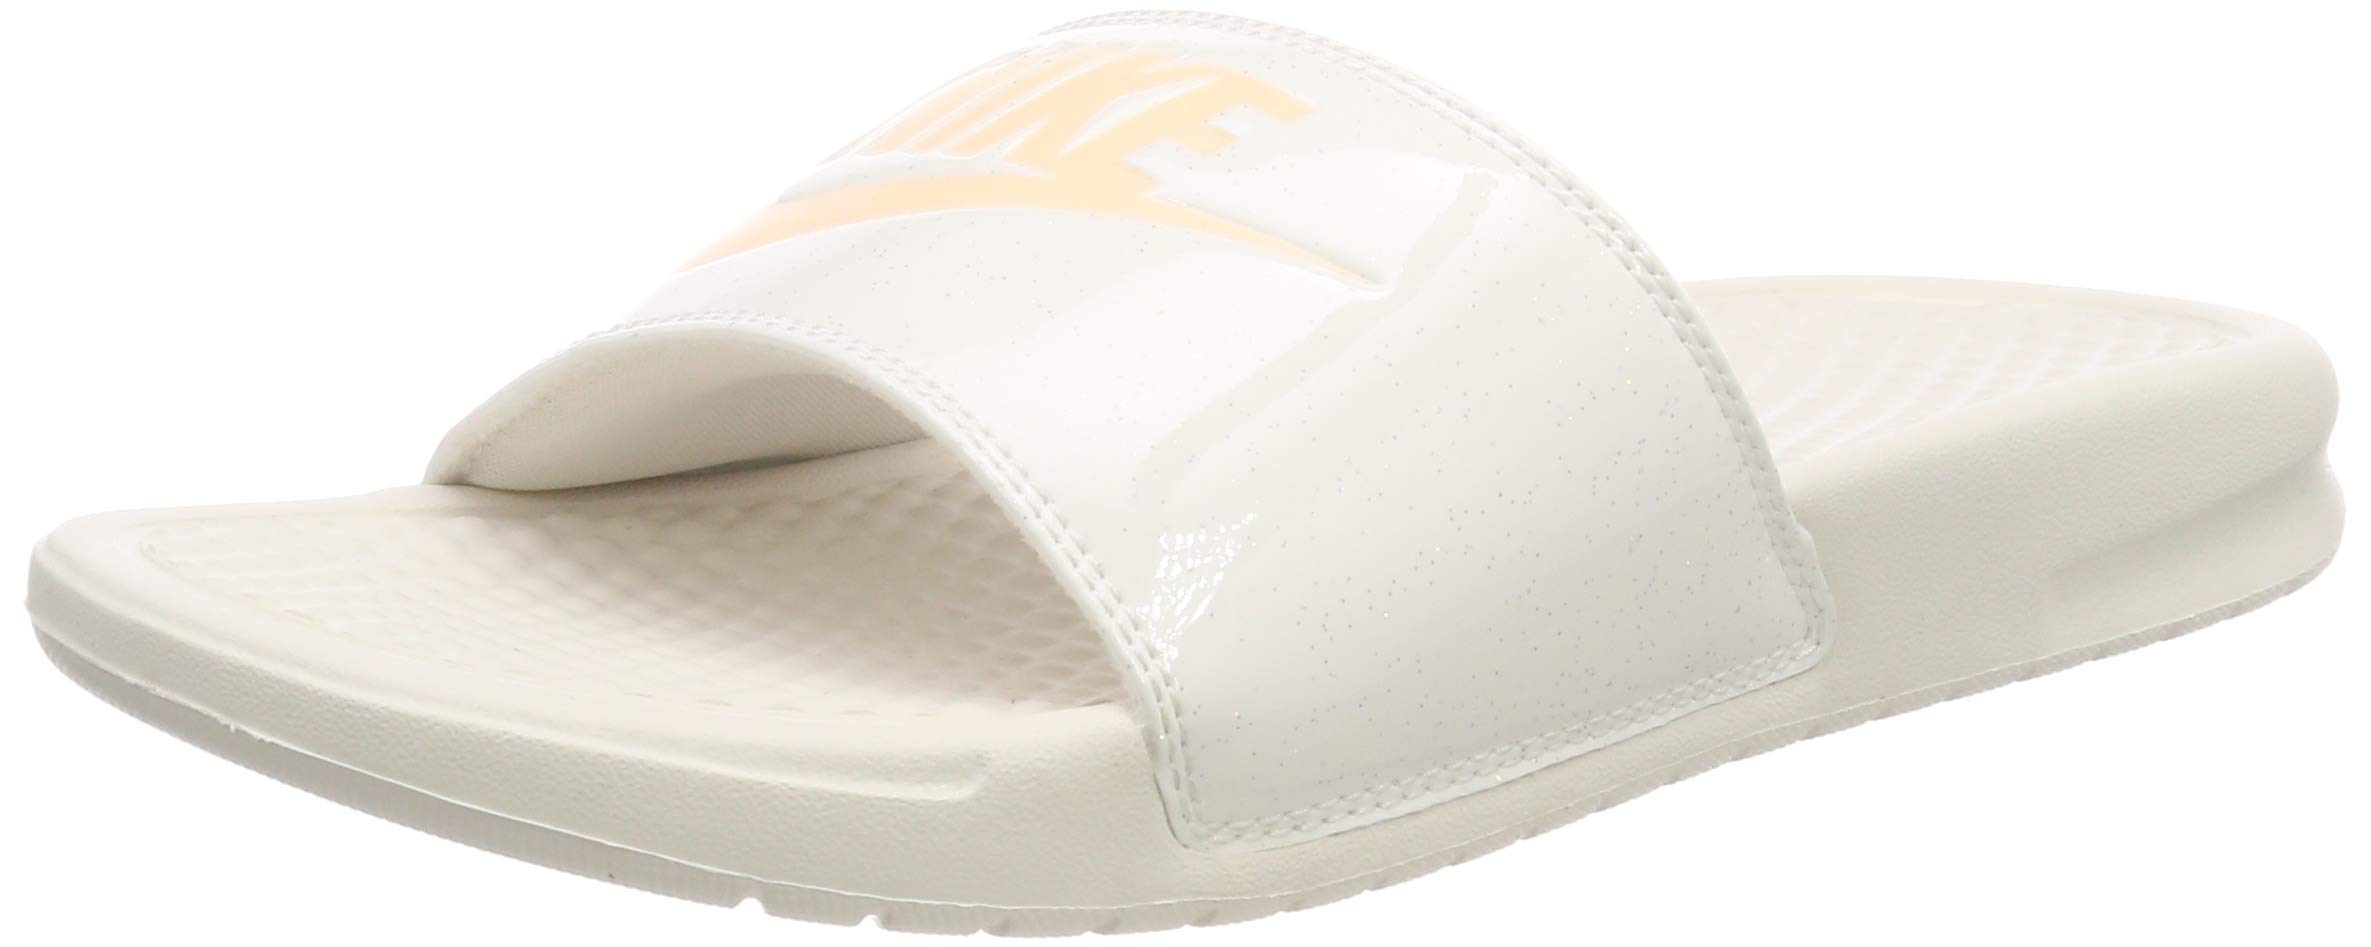 48ab6549a2a7 Galleon - Nike WMNS Benassi JDI Print Womens 618919-021 Size 7